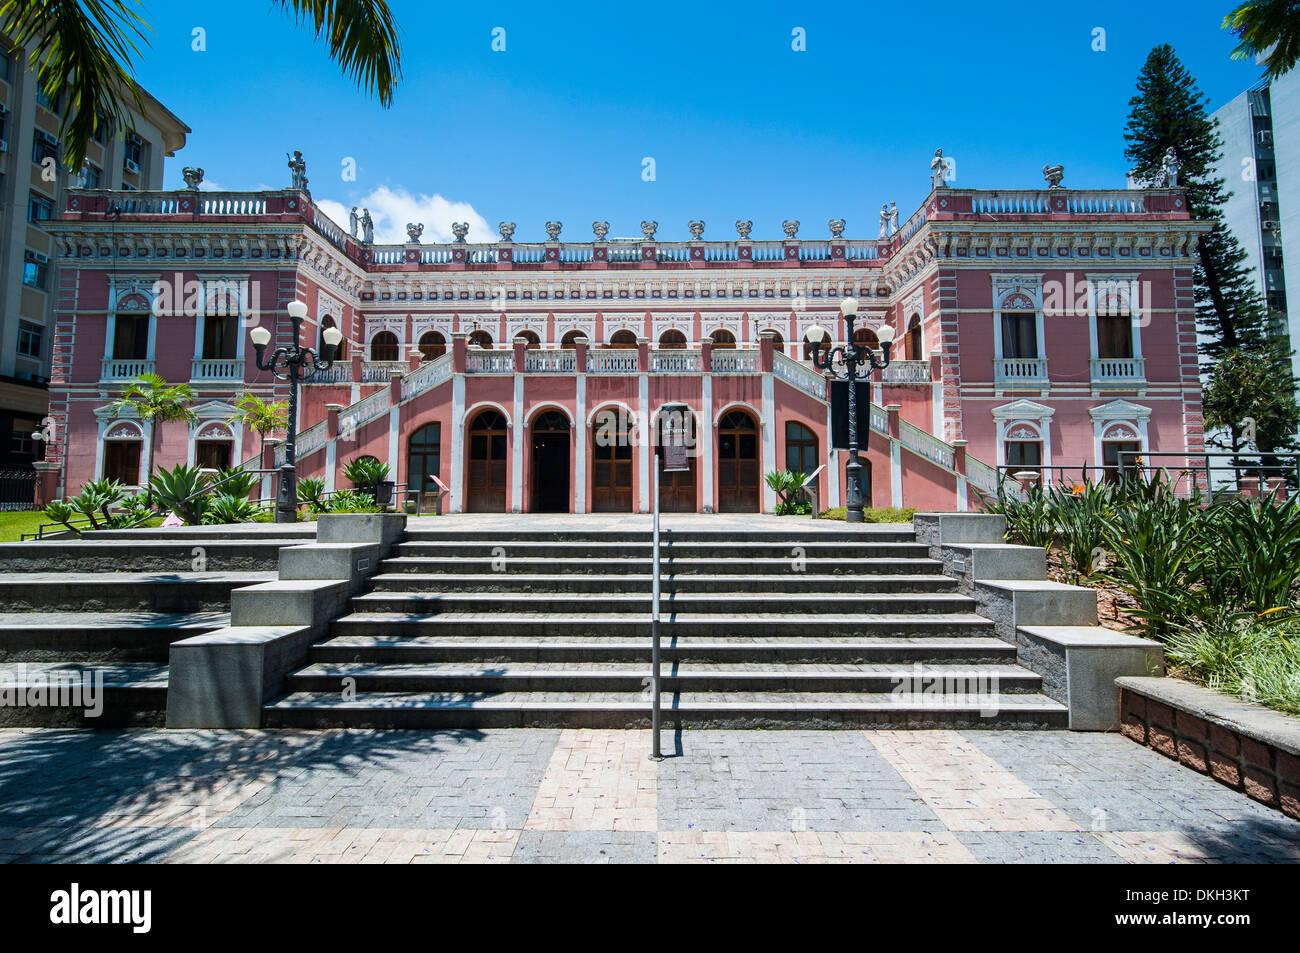 Pink Cruz e Sousa palace in Florianopolis, Santa Catarina State, Brazil, South America - Stock Image